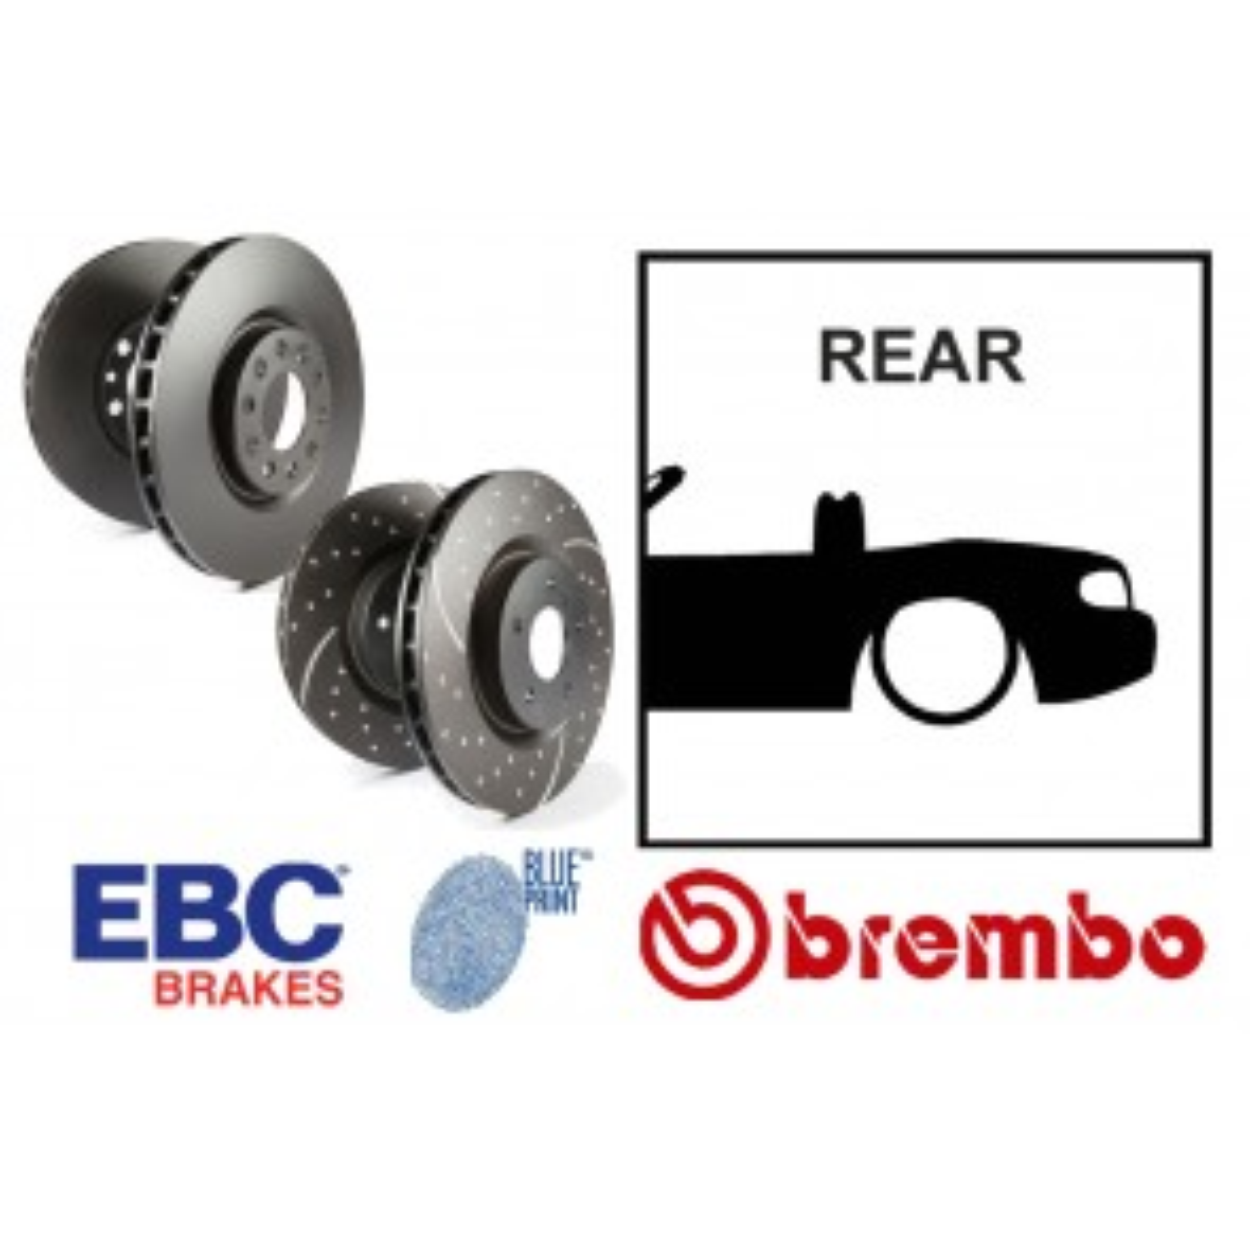 OE Replacement & EBC GD Series Rear Brake Discs - Mazda MX5 Mk3 NC 05-15